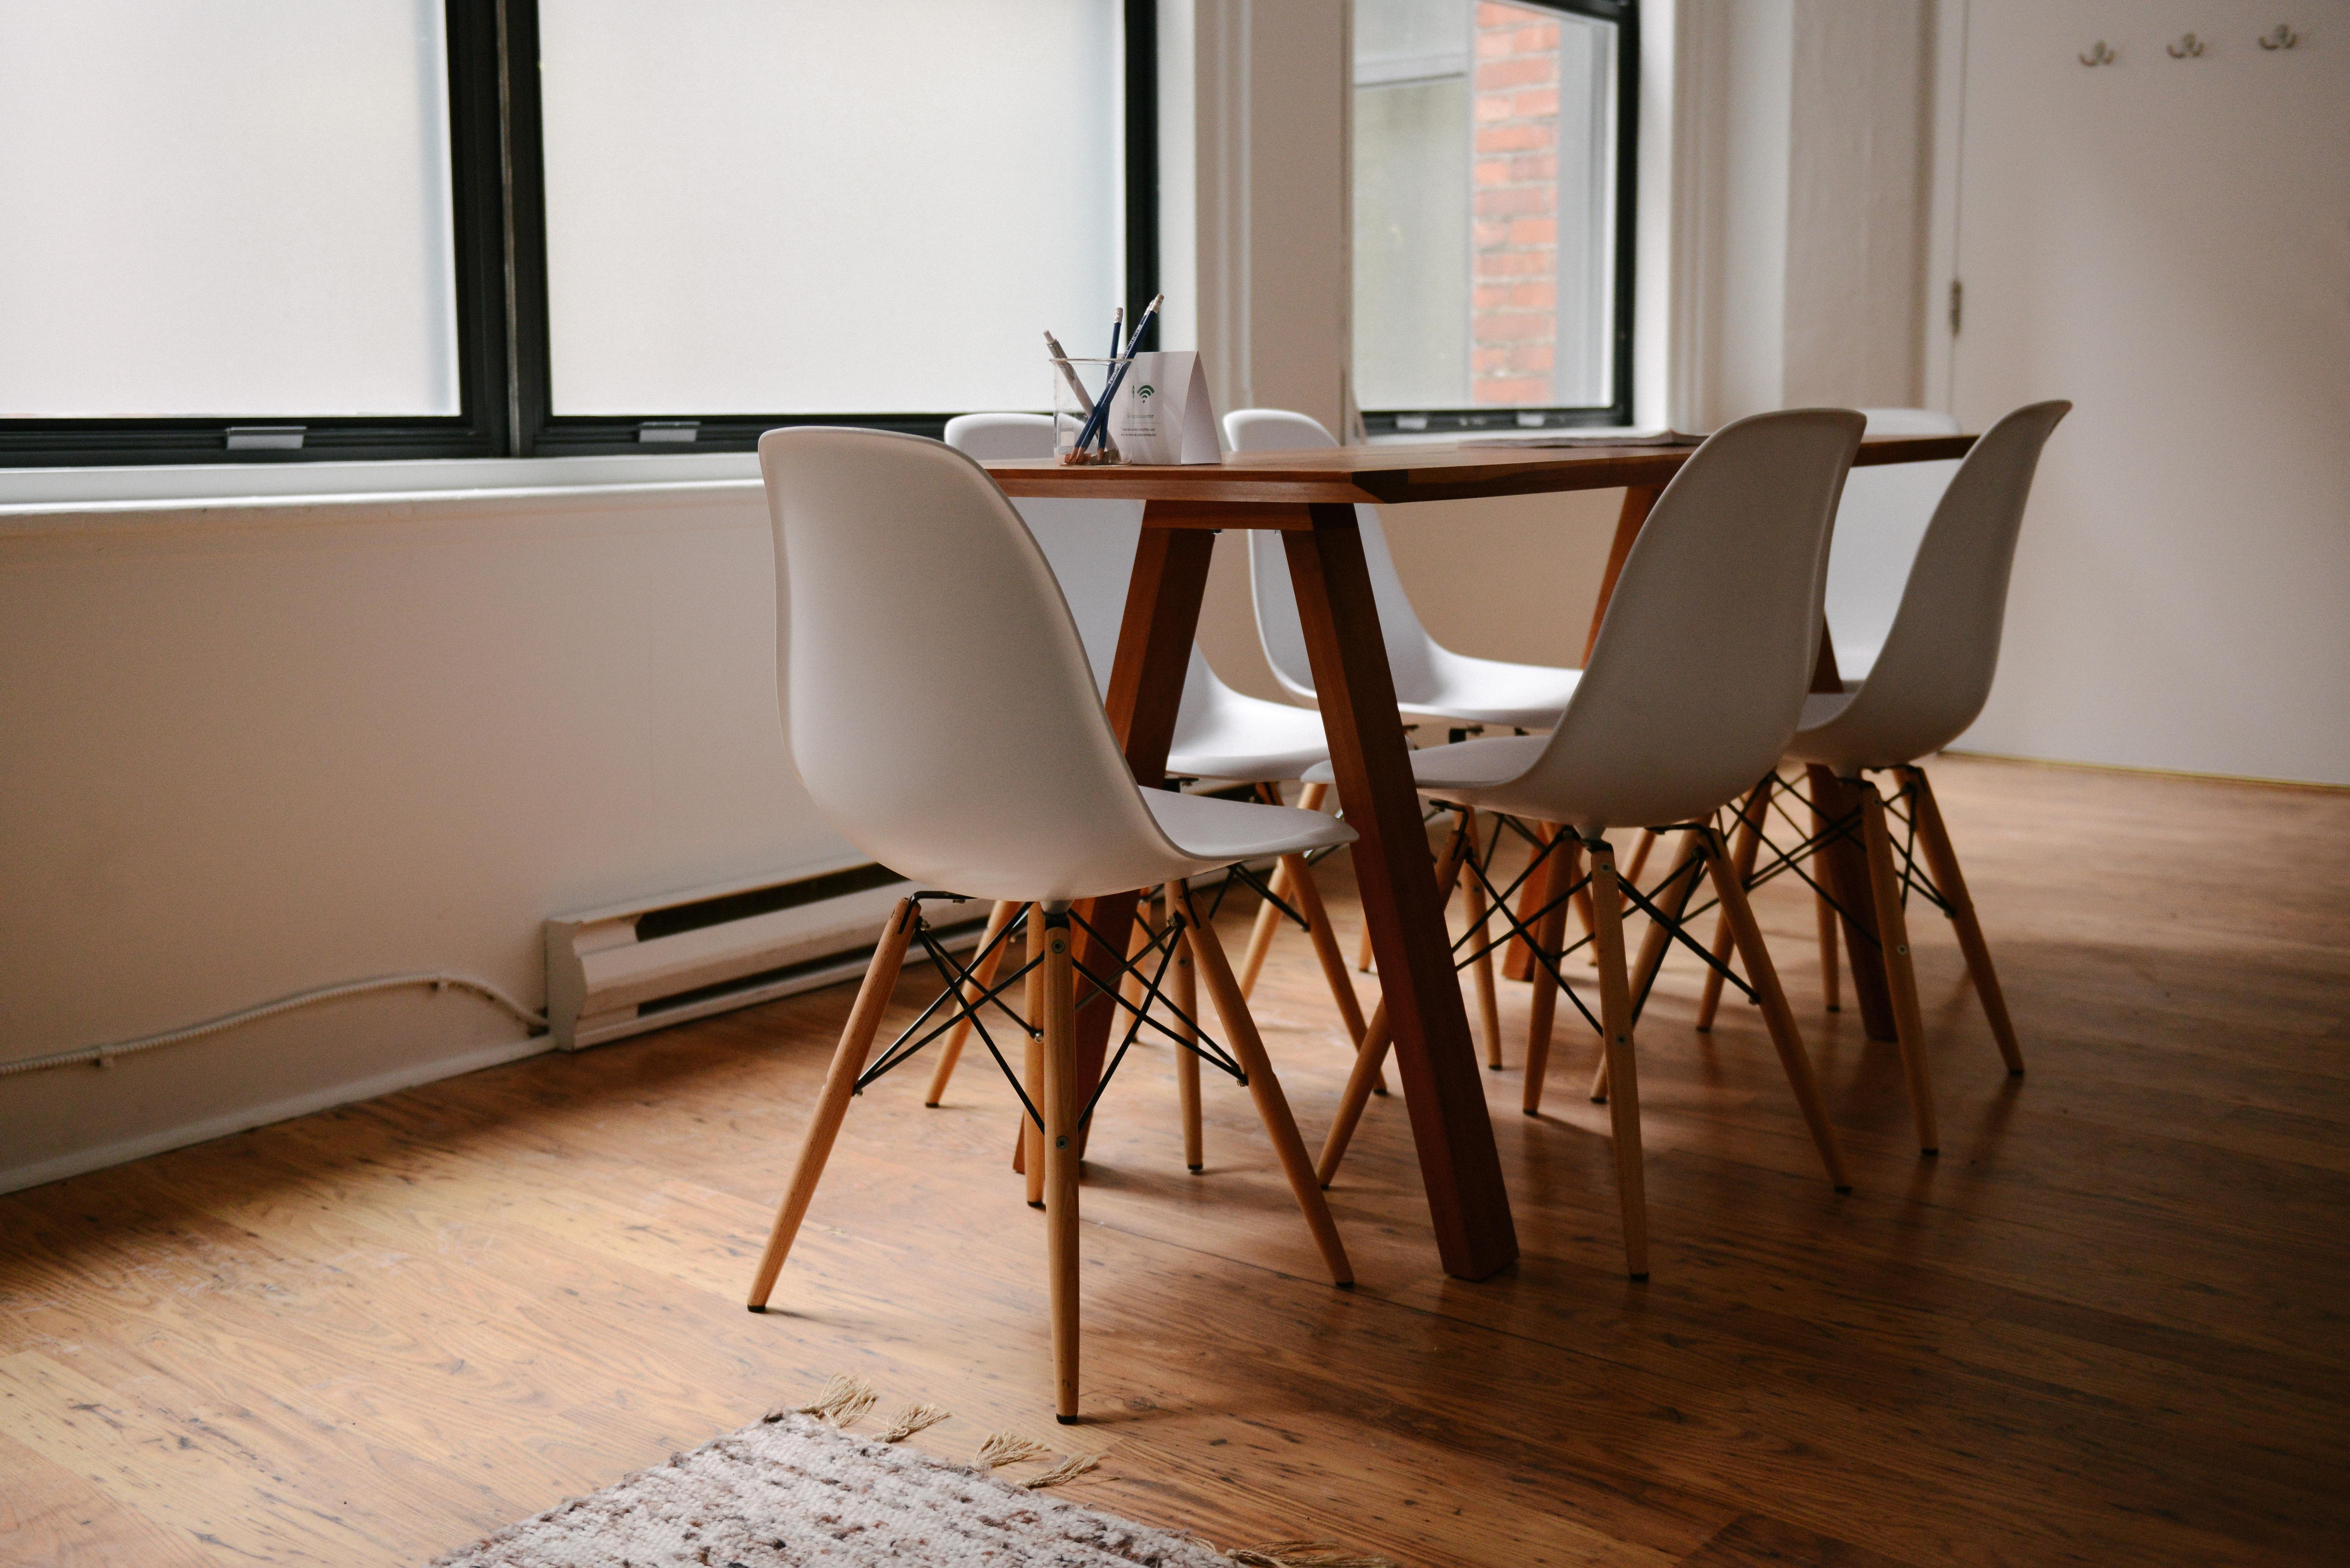 Desk Table Wood Chair Floor Home Property Living Room Furniture Work Space Office Meeting